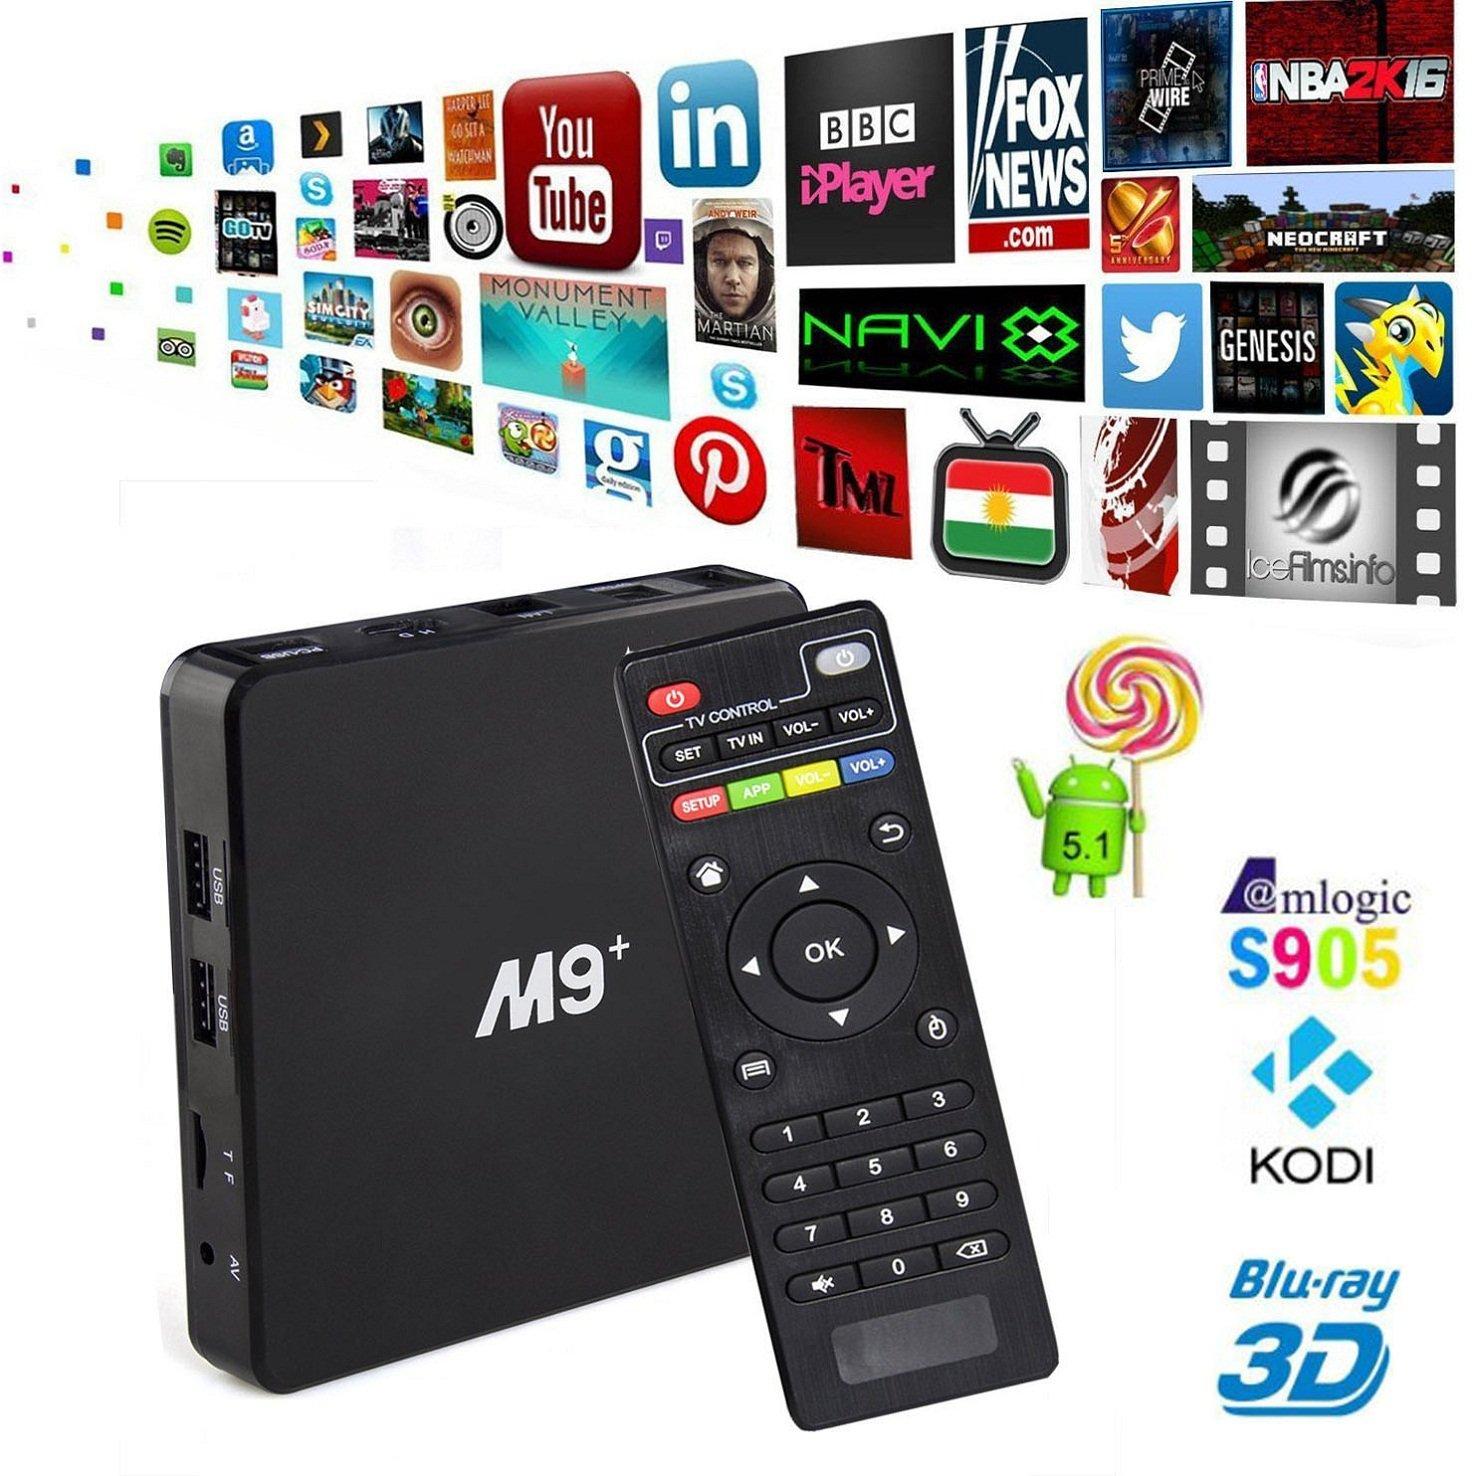 trongle M9 Plus M9 + Android TV Box Amlogic s905 Kodi totalmente integrado beladene Android 5.1 Lollipop OS TV CAJA DE 4 Núcleo 1 G/8G 4 K Google Streaming Media Players con